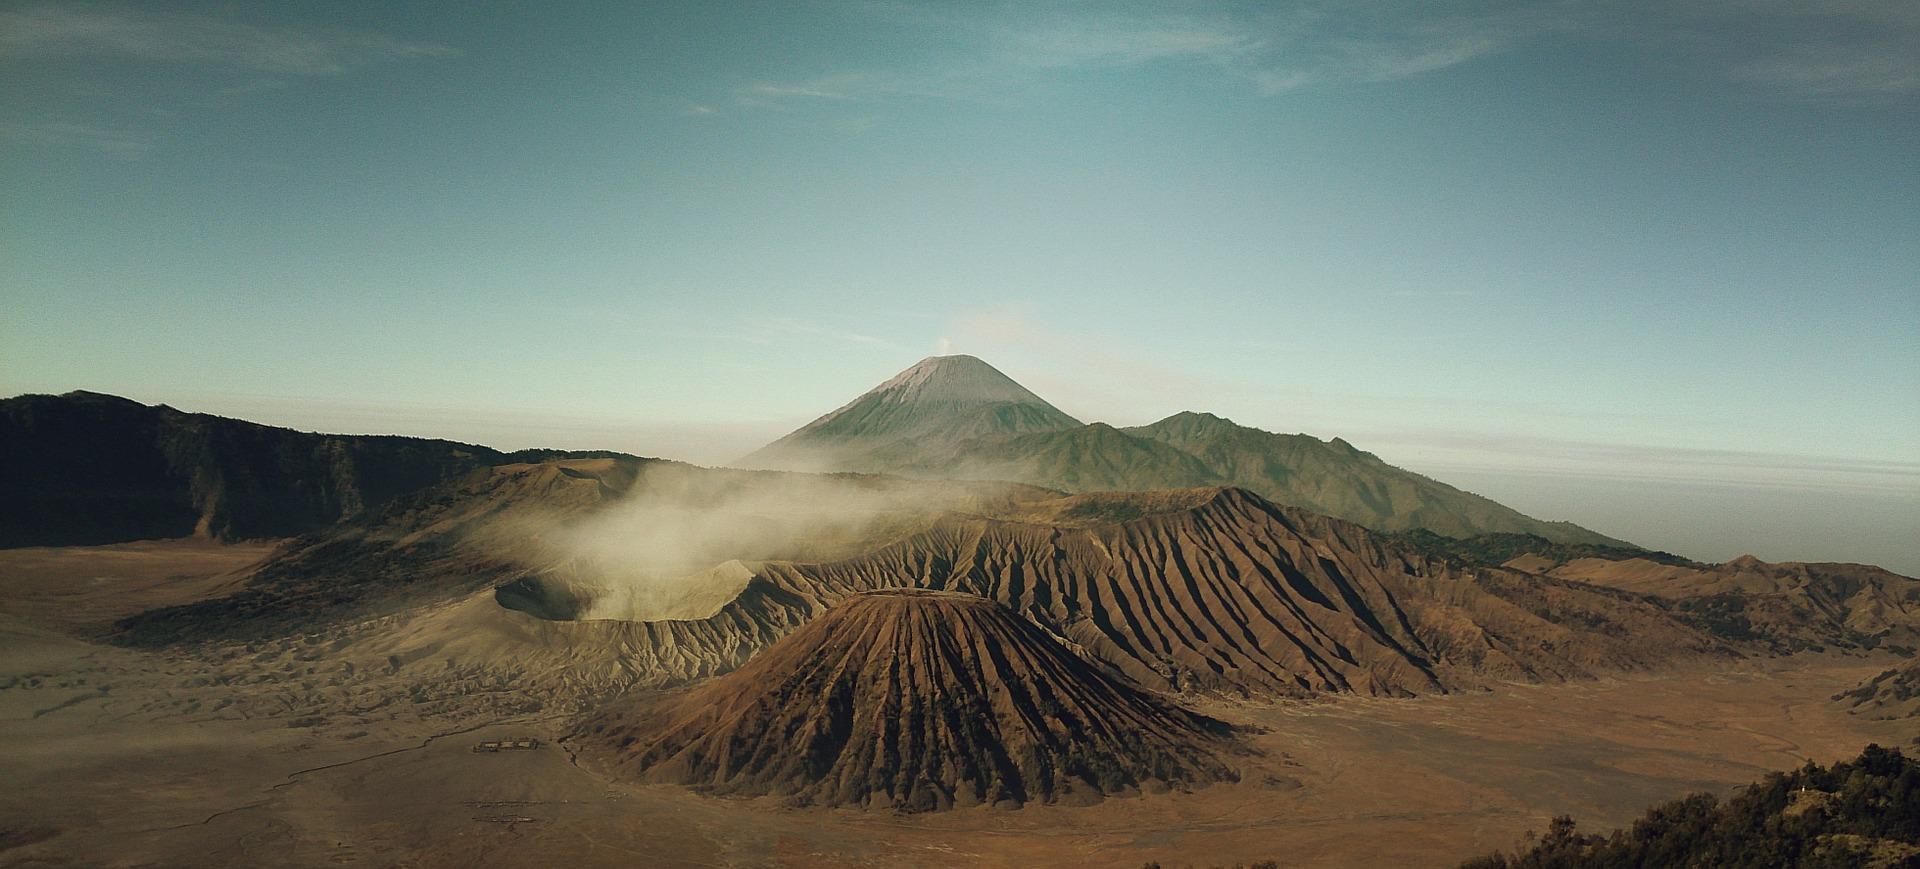 volcanoes 569820 1920